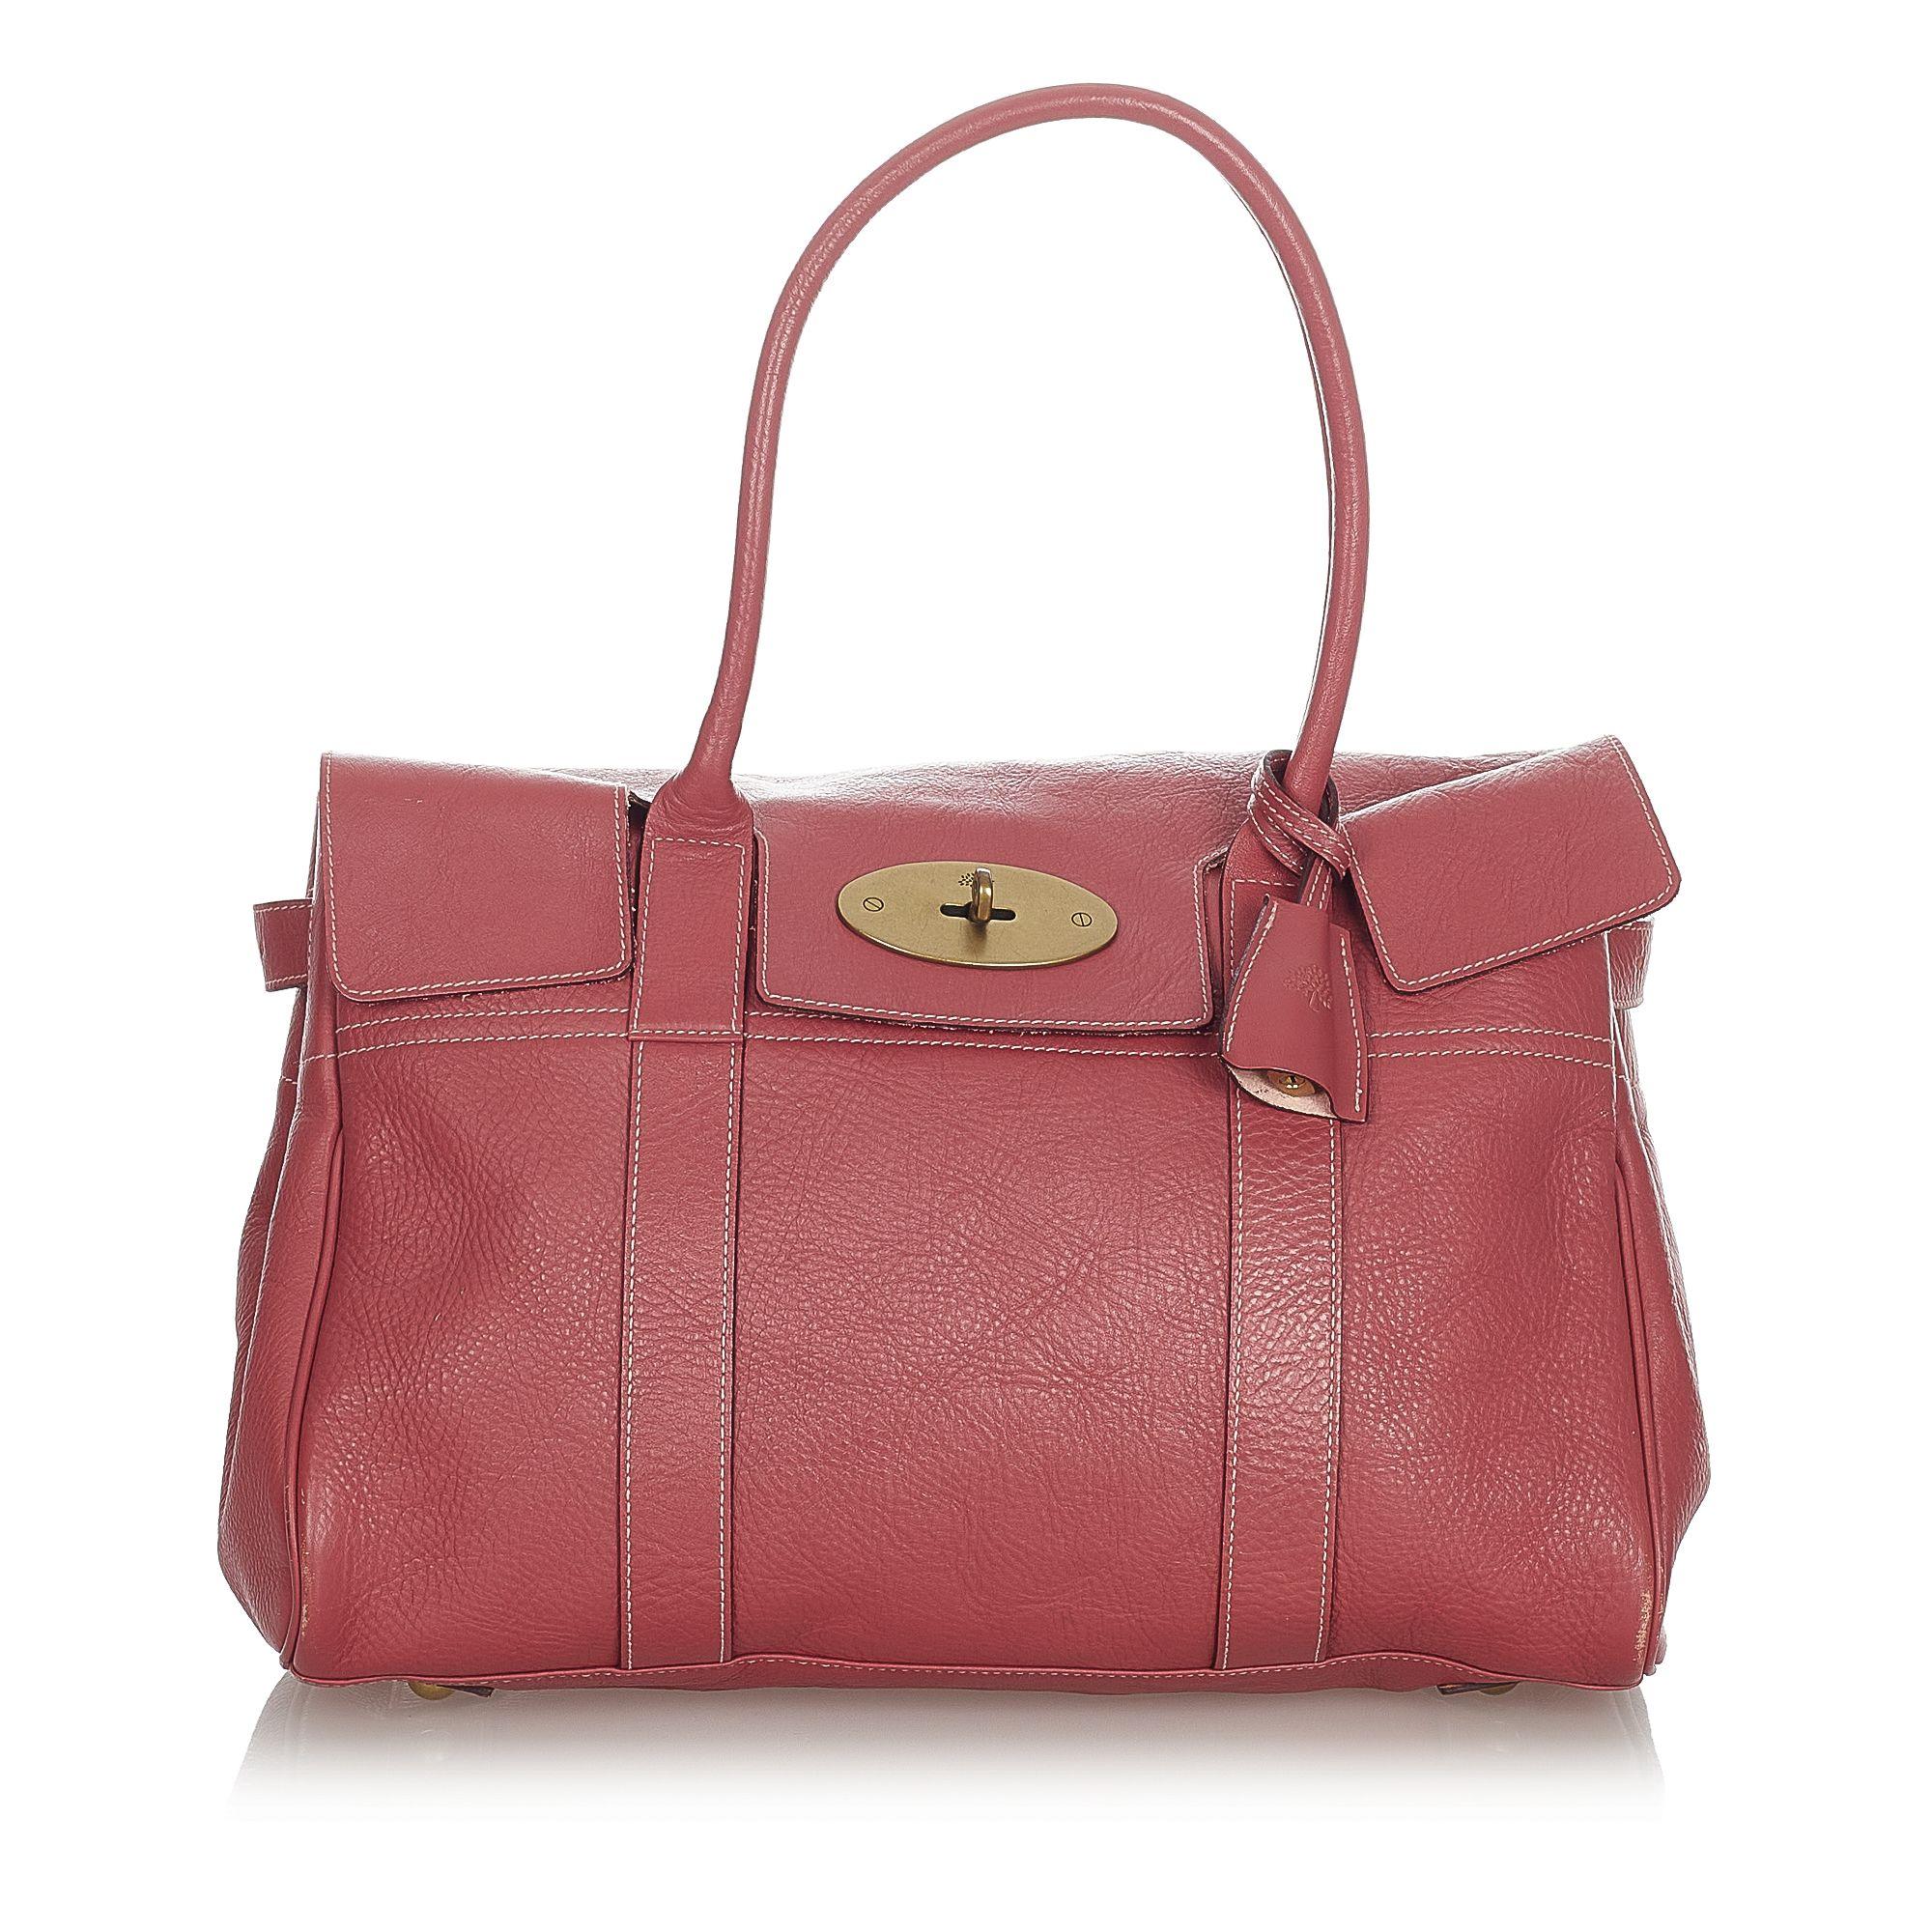 Vintage Mulberry Bayswater Leather Handbag Red